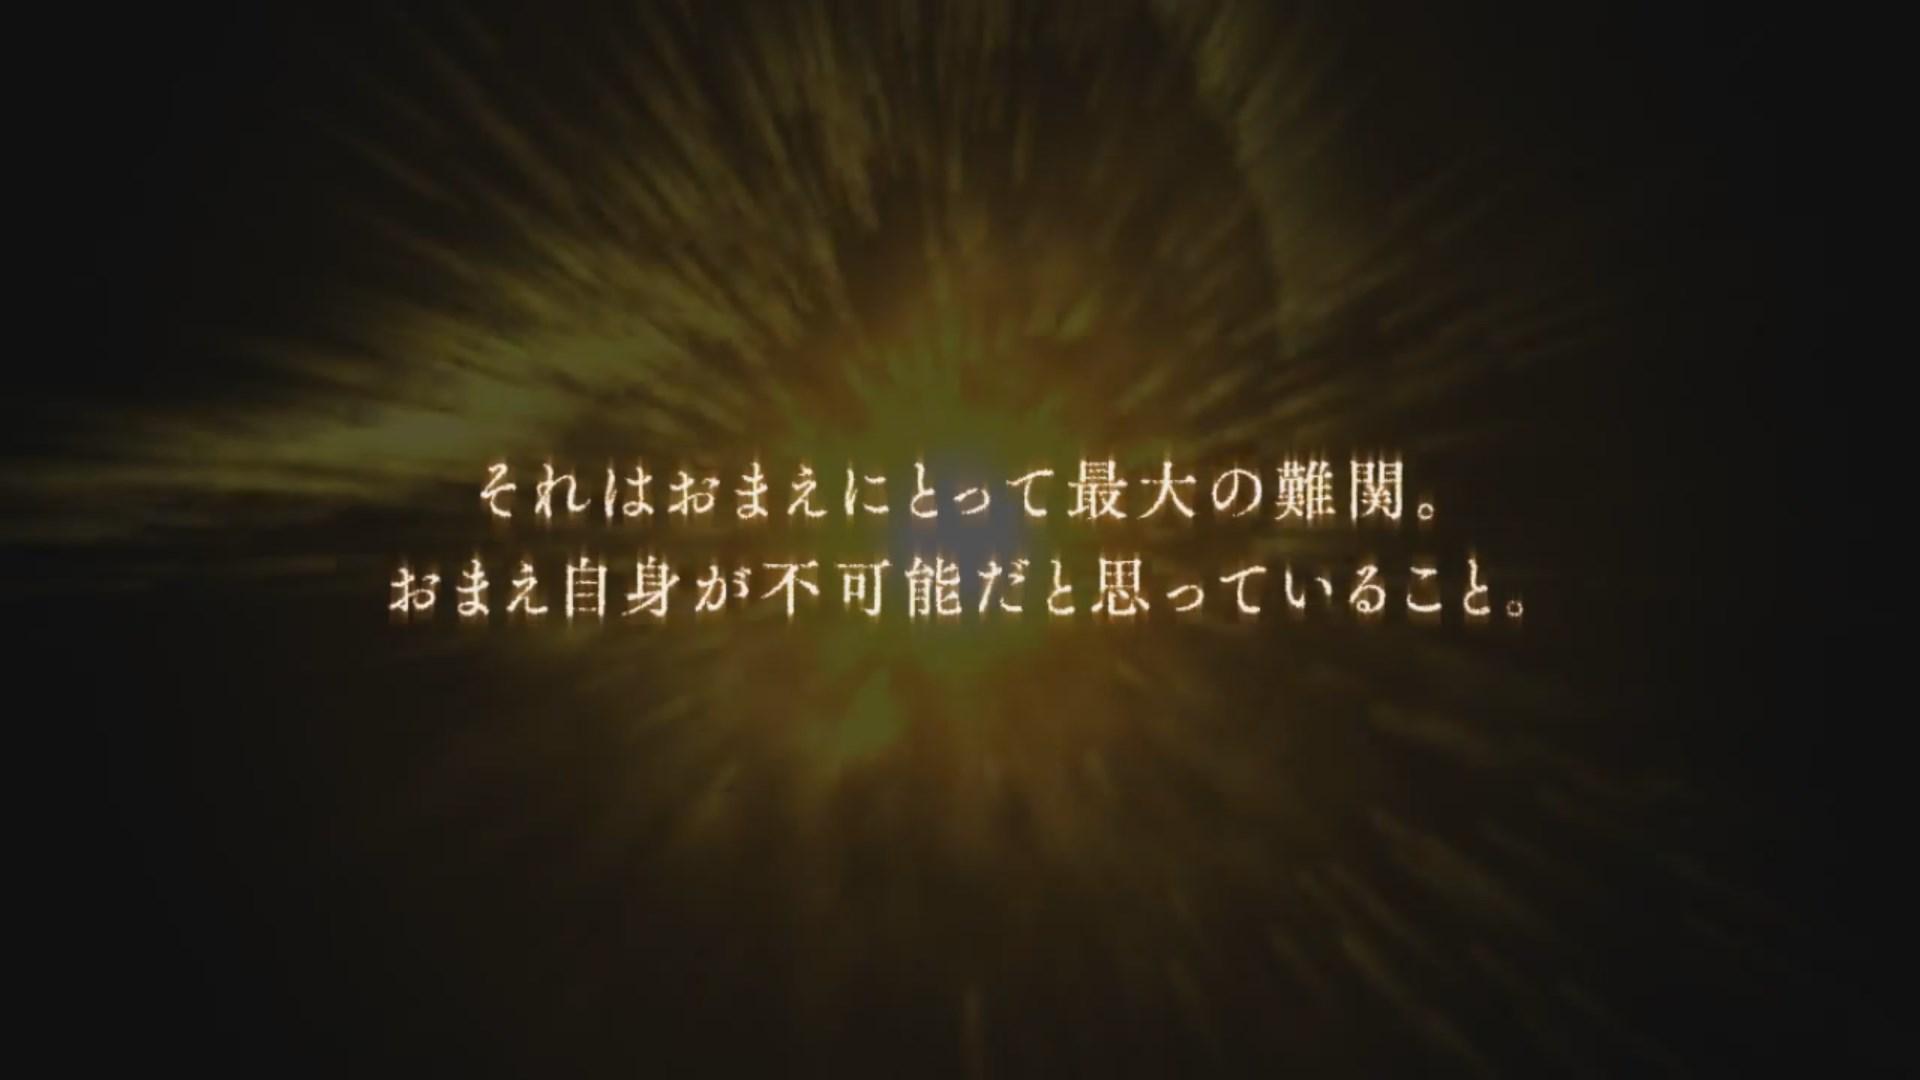 2b9c7828.jpg